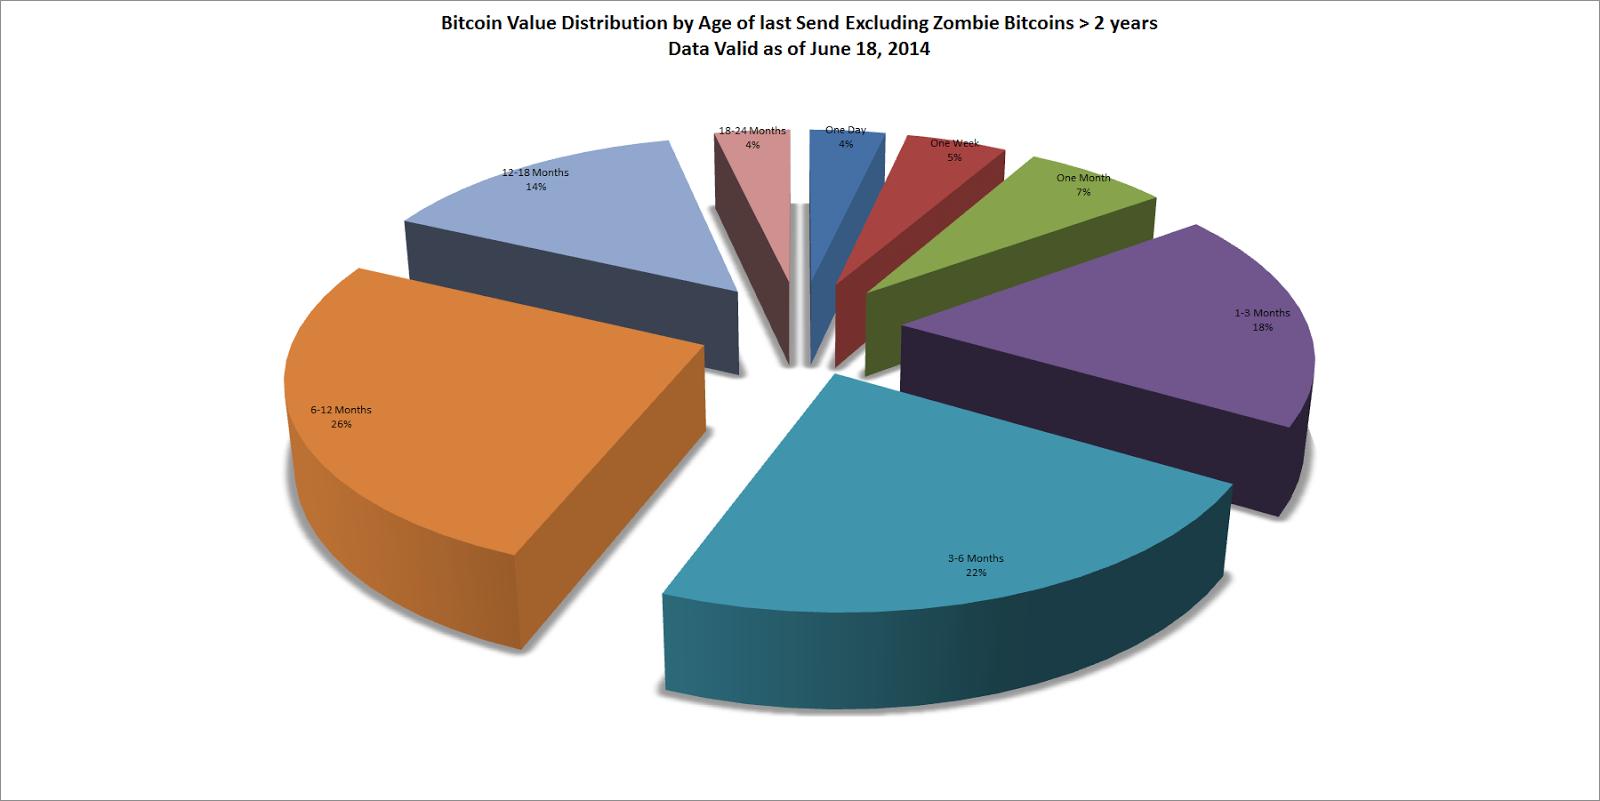 BitcoinValueDistributionByAgeOfLastSendExcludingZombieBitcoins.png